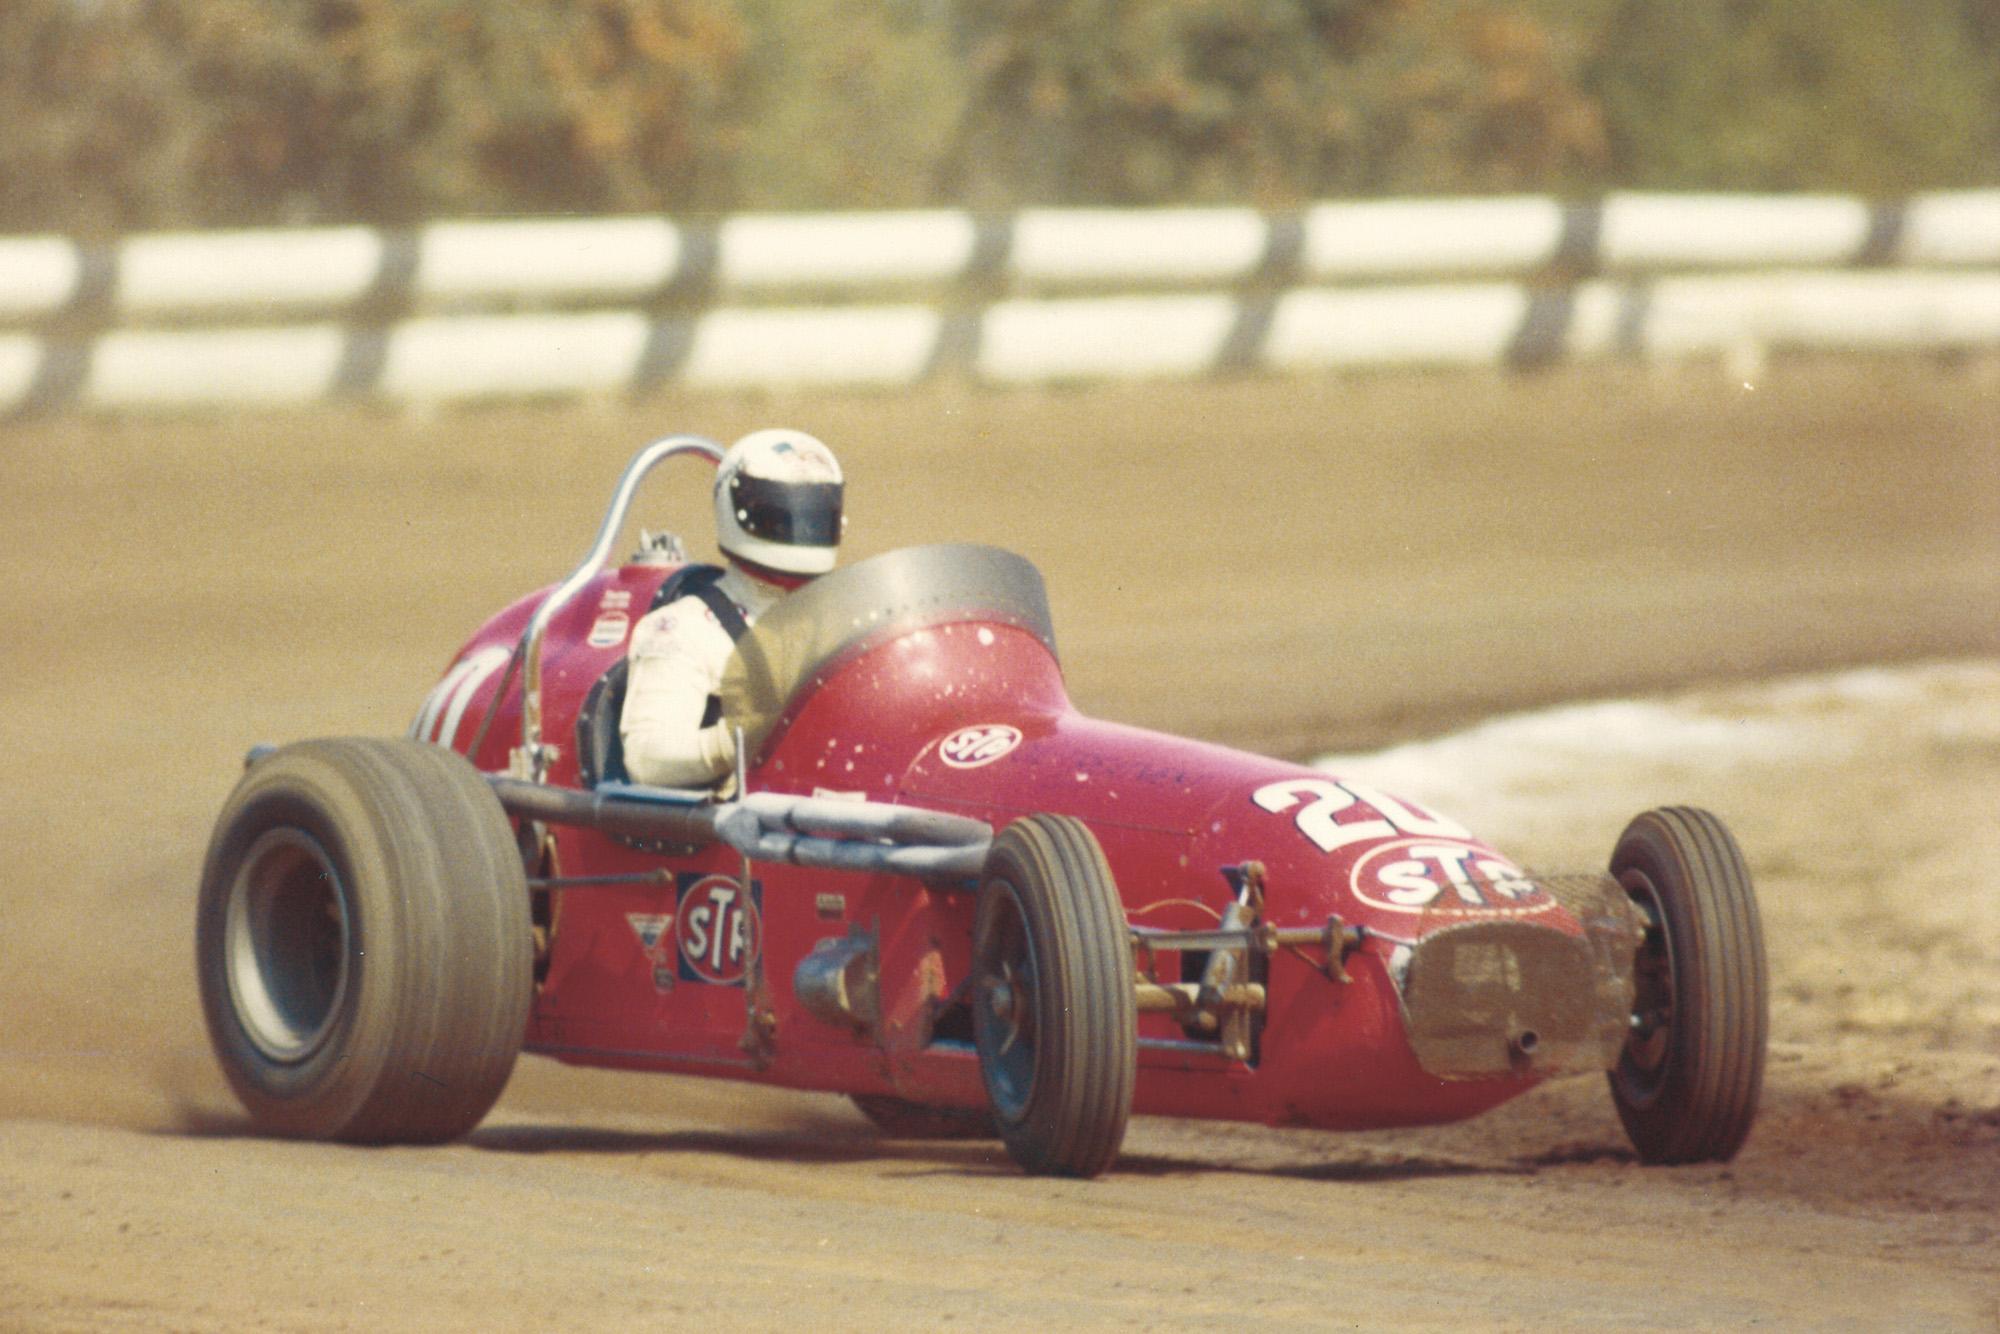 Billy Vukovich, 1970, dirt racing